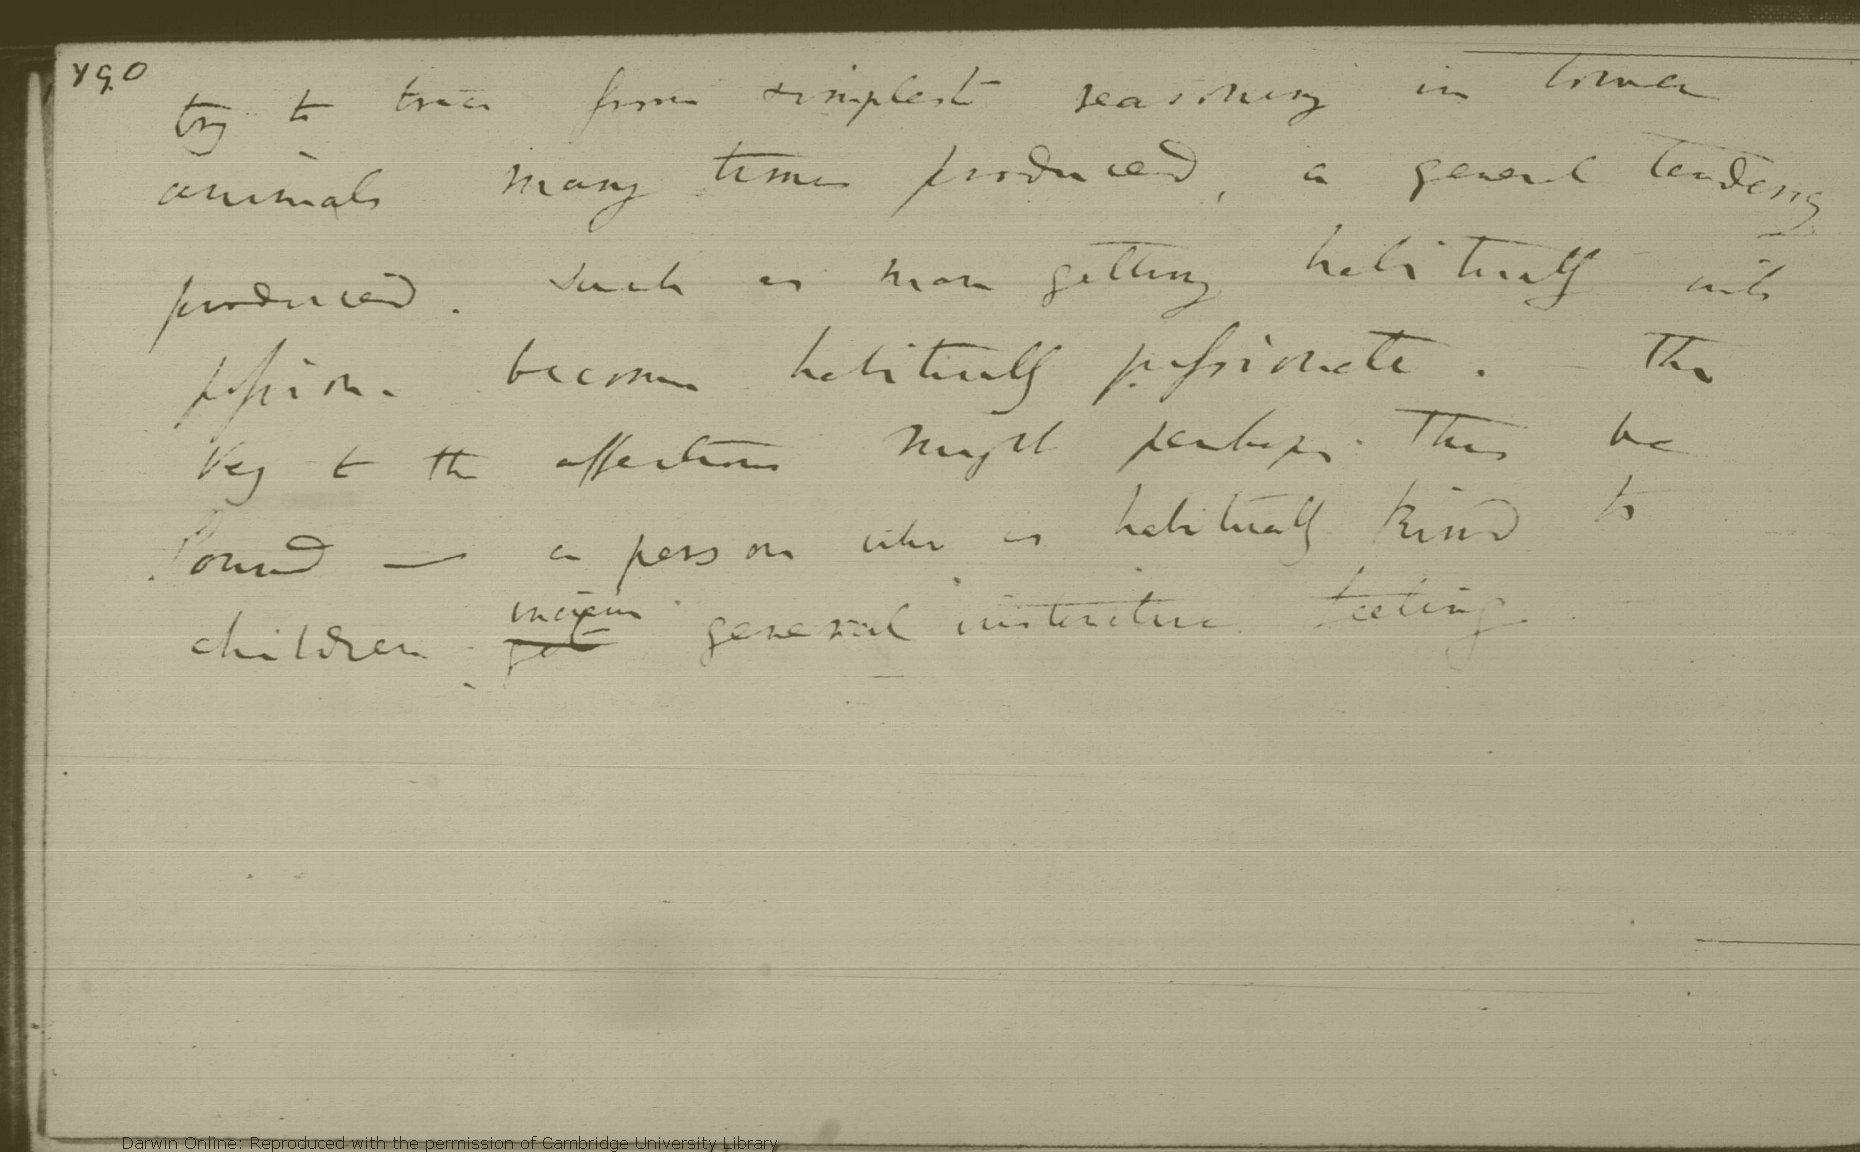 Photograph of Darwin's notebook C, p. 166